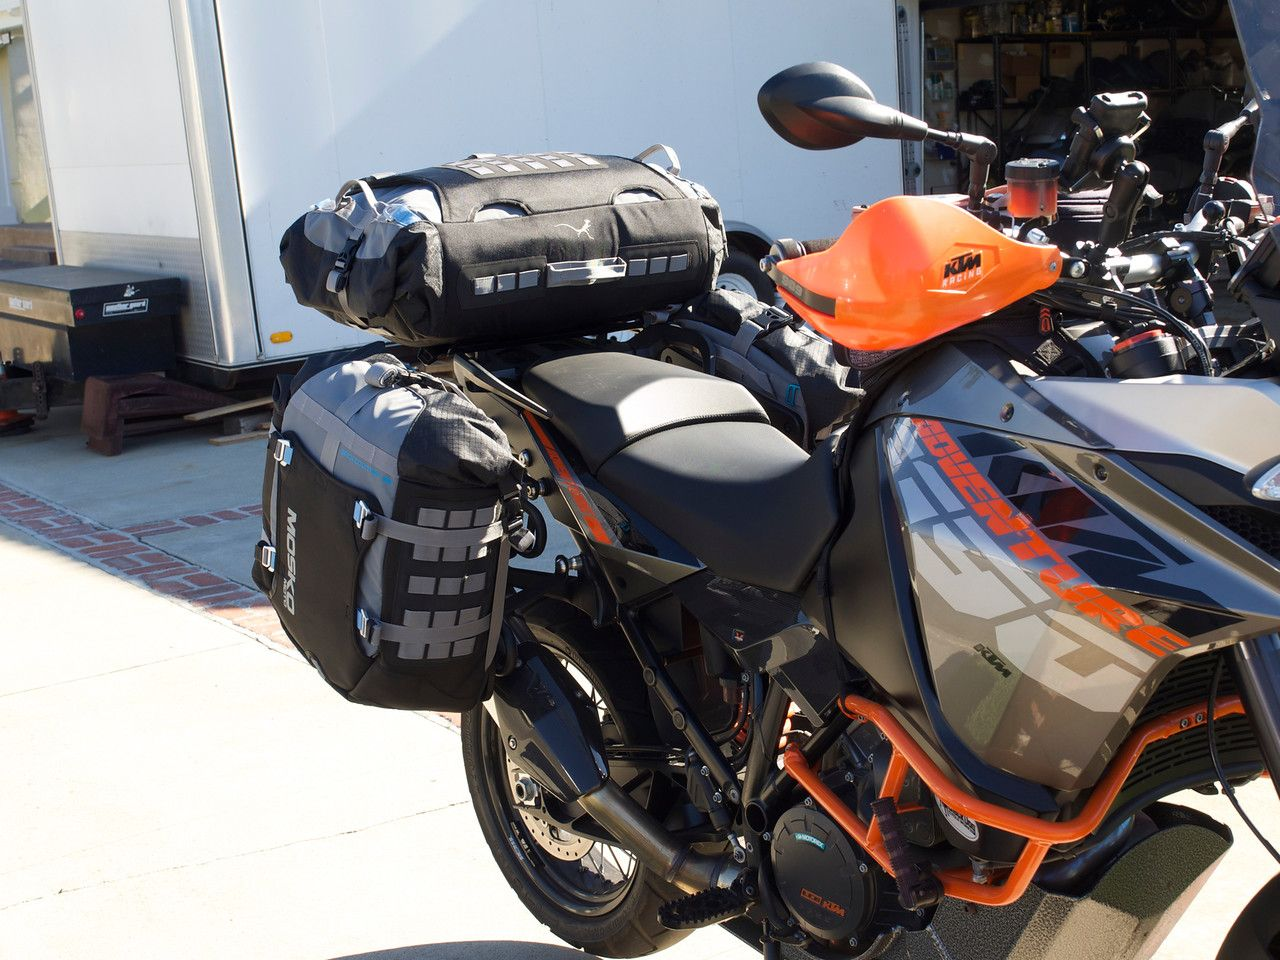 Ktm 1190 Adventure With Mosko Moto Panniers On Jesse Rack Ktm Adventure Adventure Bike Ktm